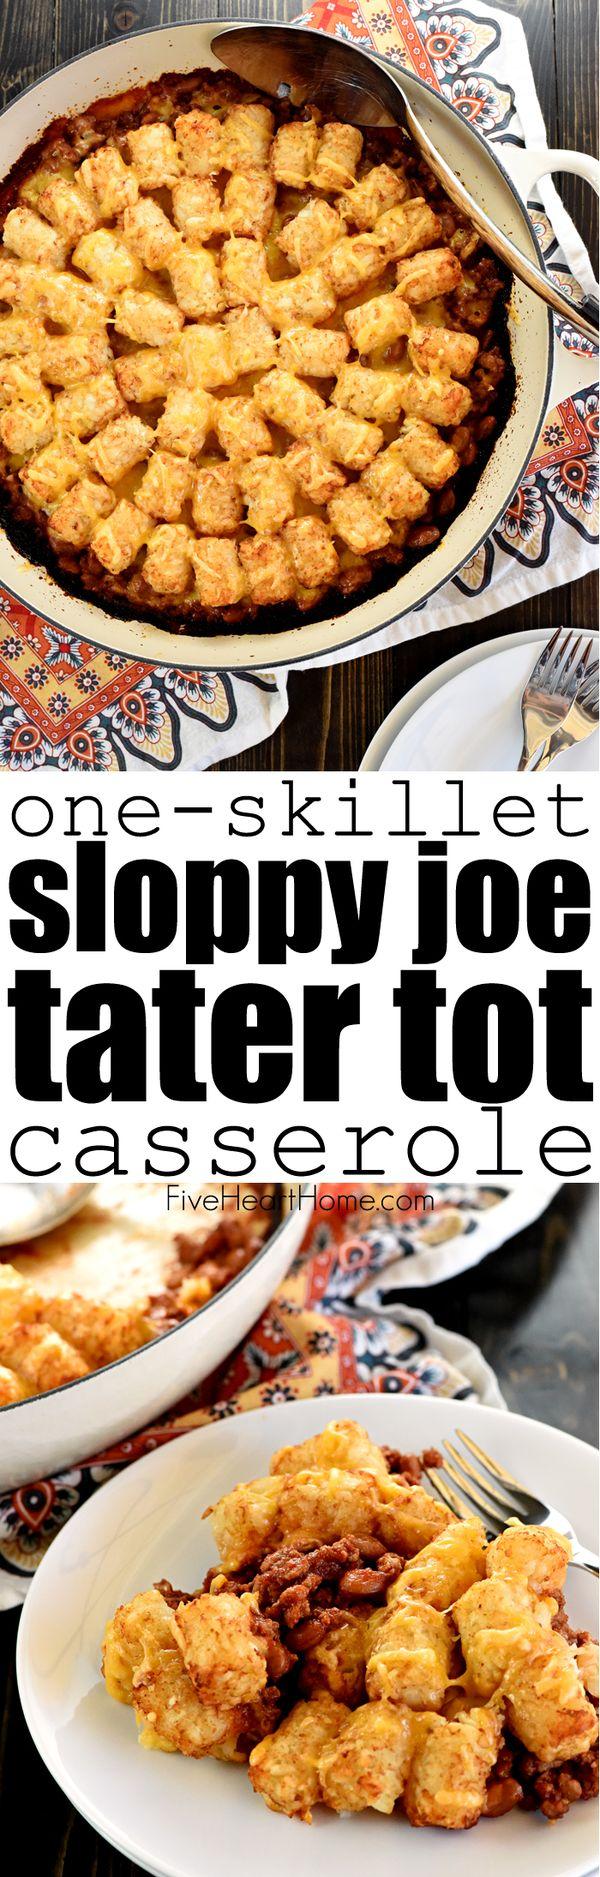 One-Skillet Sloppy Joe Tater Tot Casserole